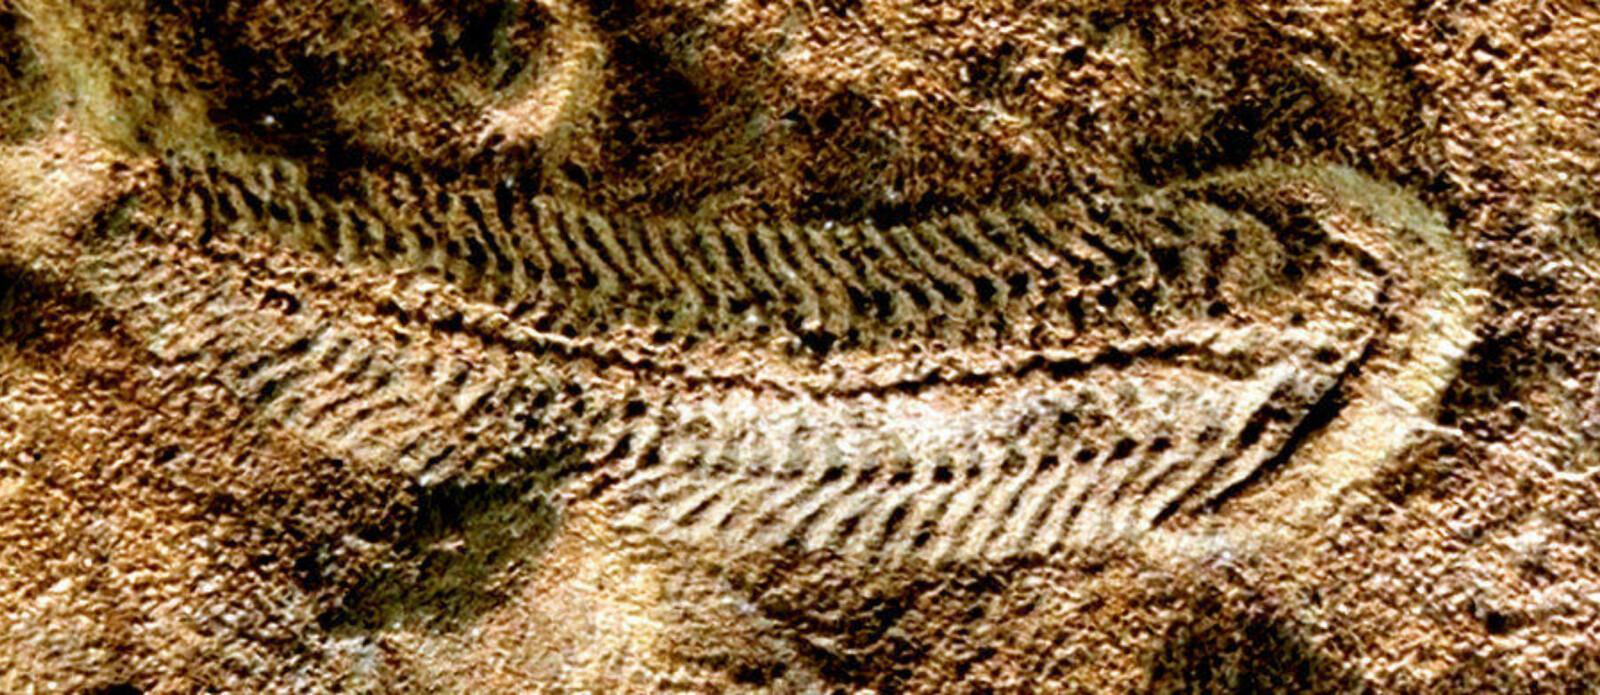 <b>FØRST UTE:</b> Enkelte tror Spriggina er trilobittens stamfar.